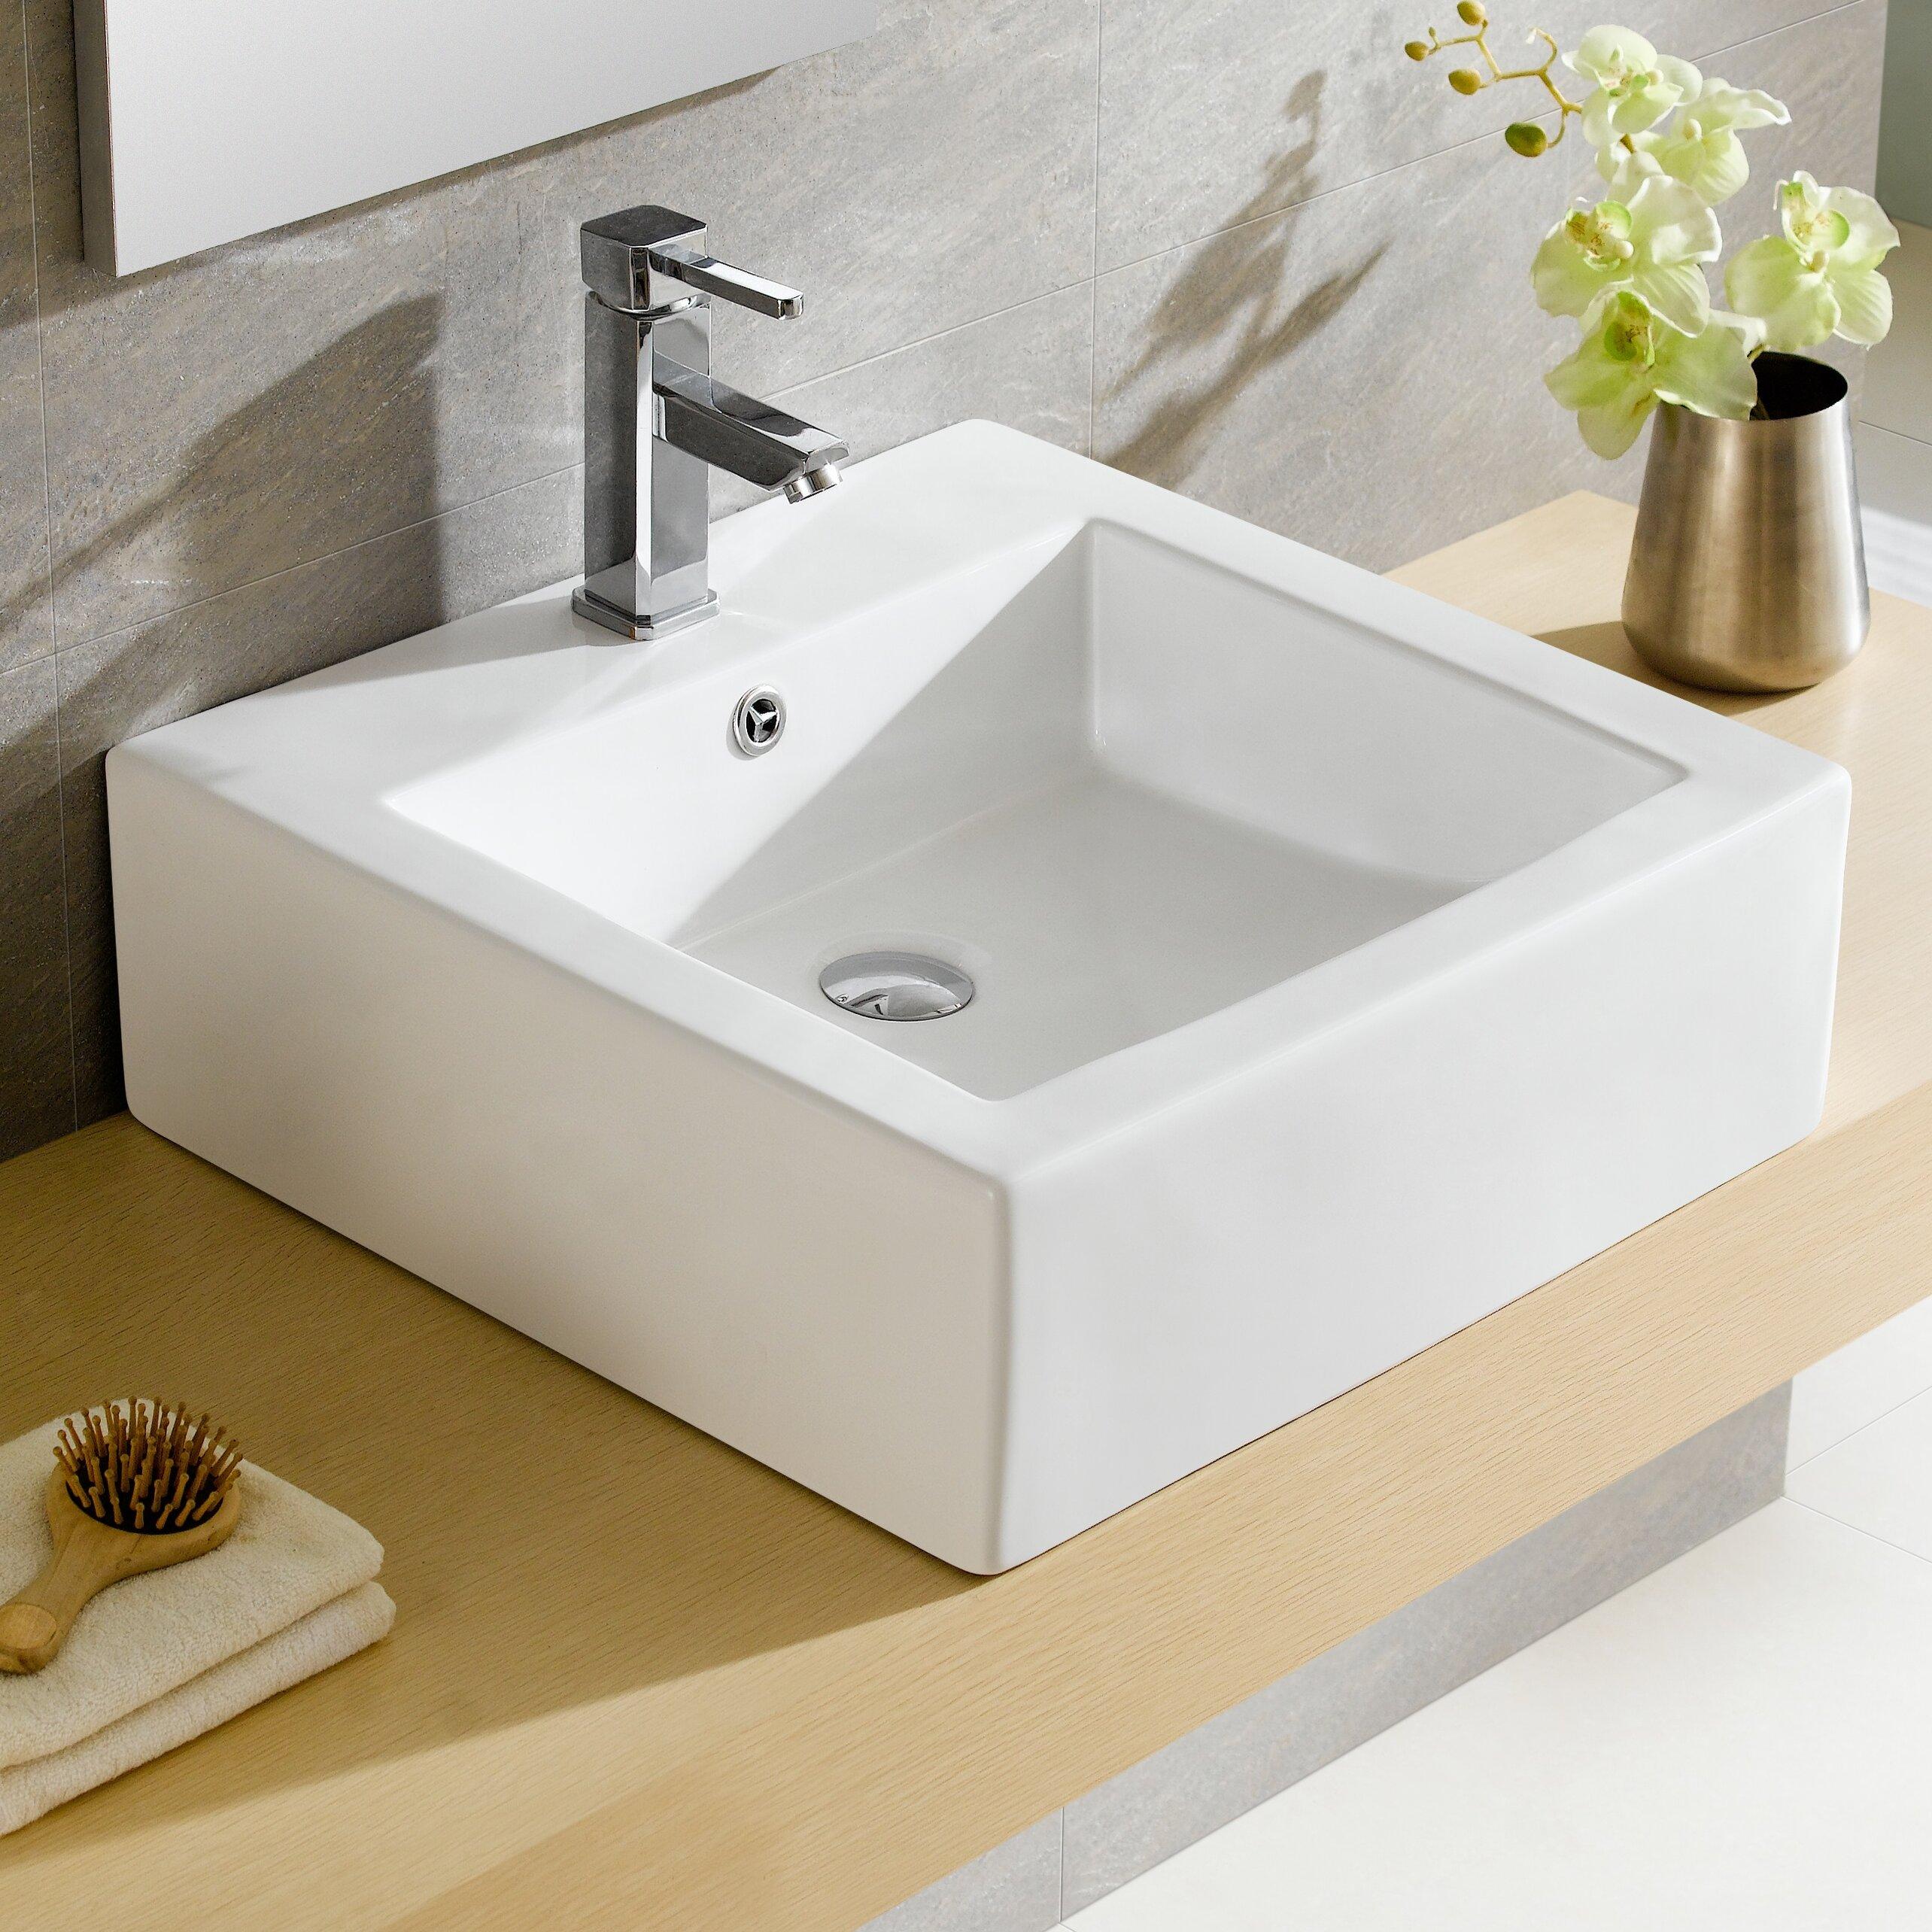 Fine Fixtures Modern Ceramic Square Vessel Bathroom Sink with ...